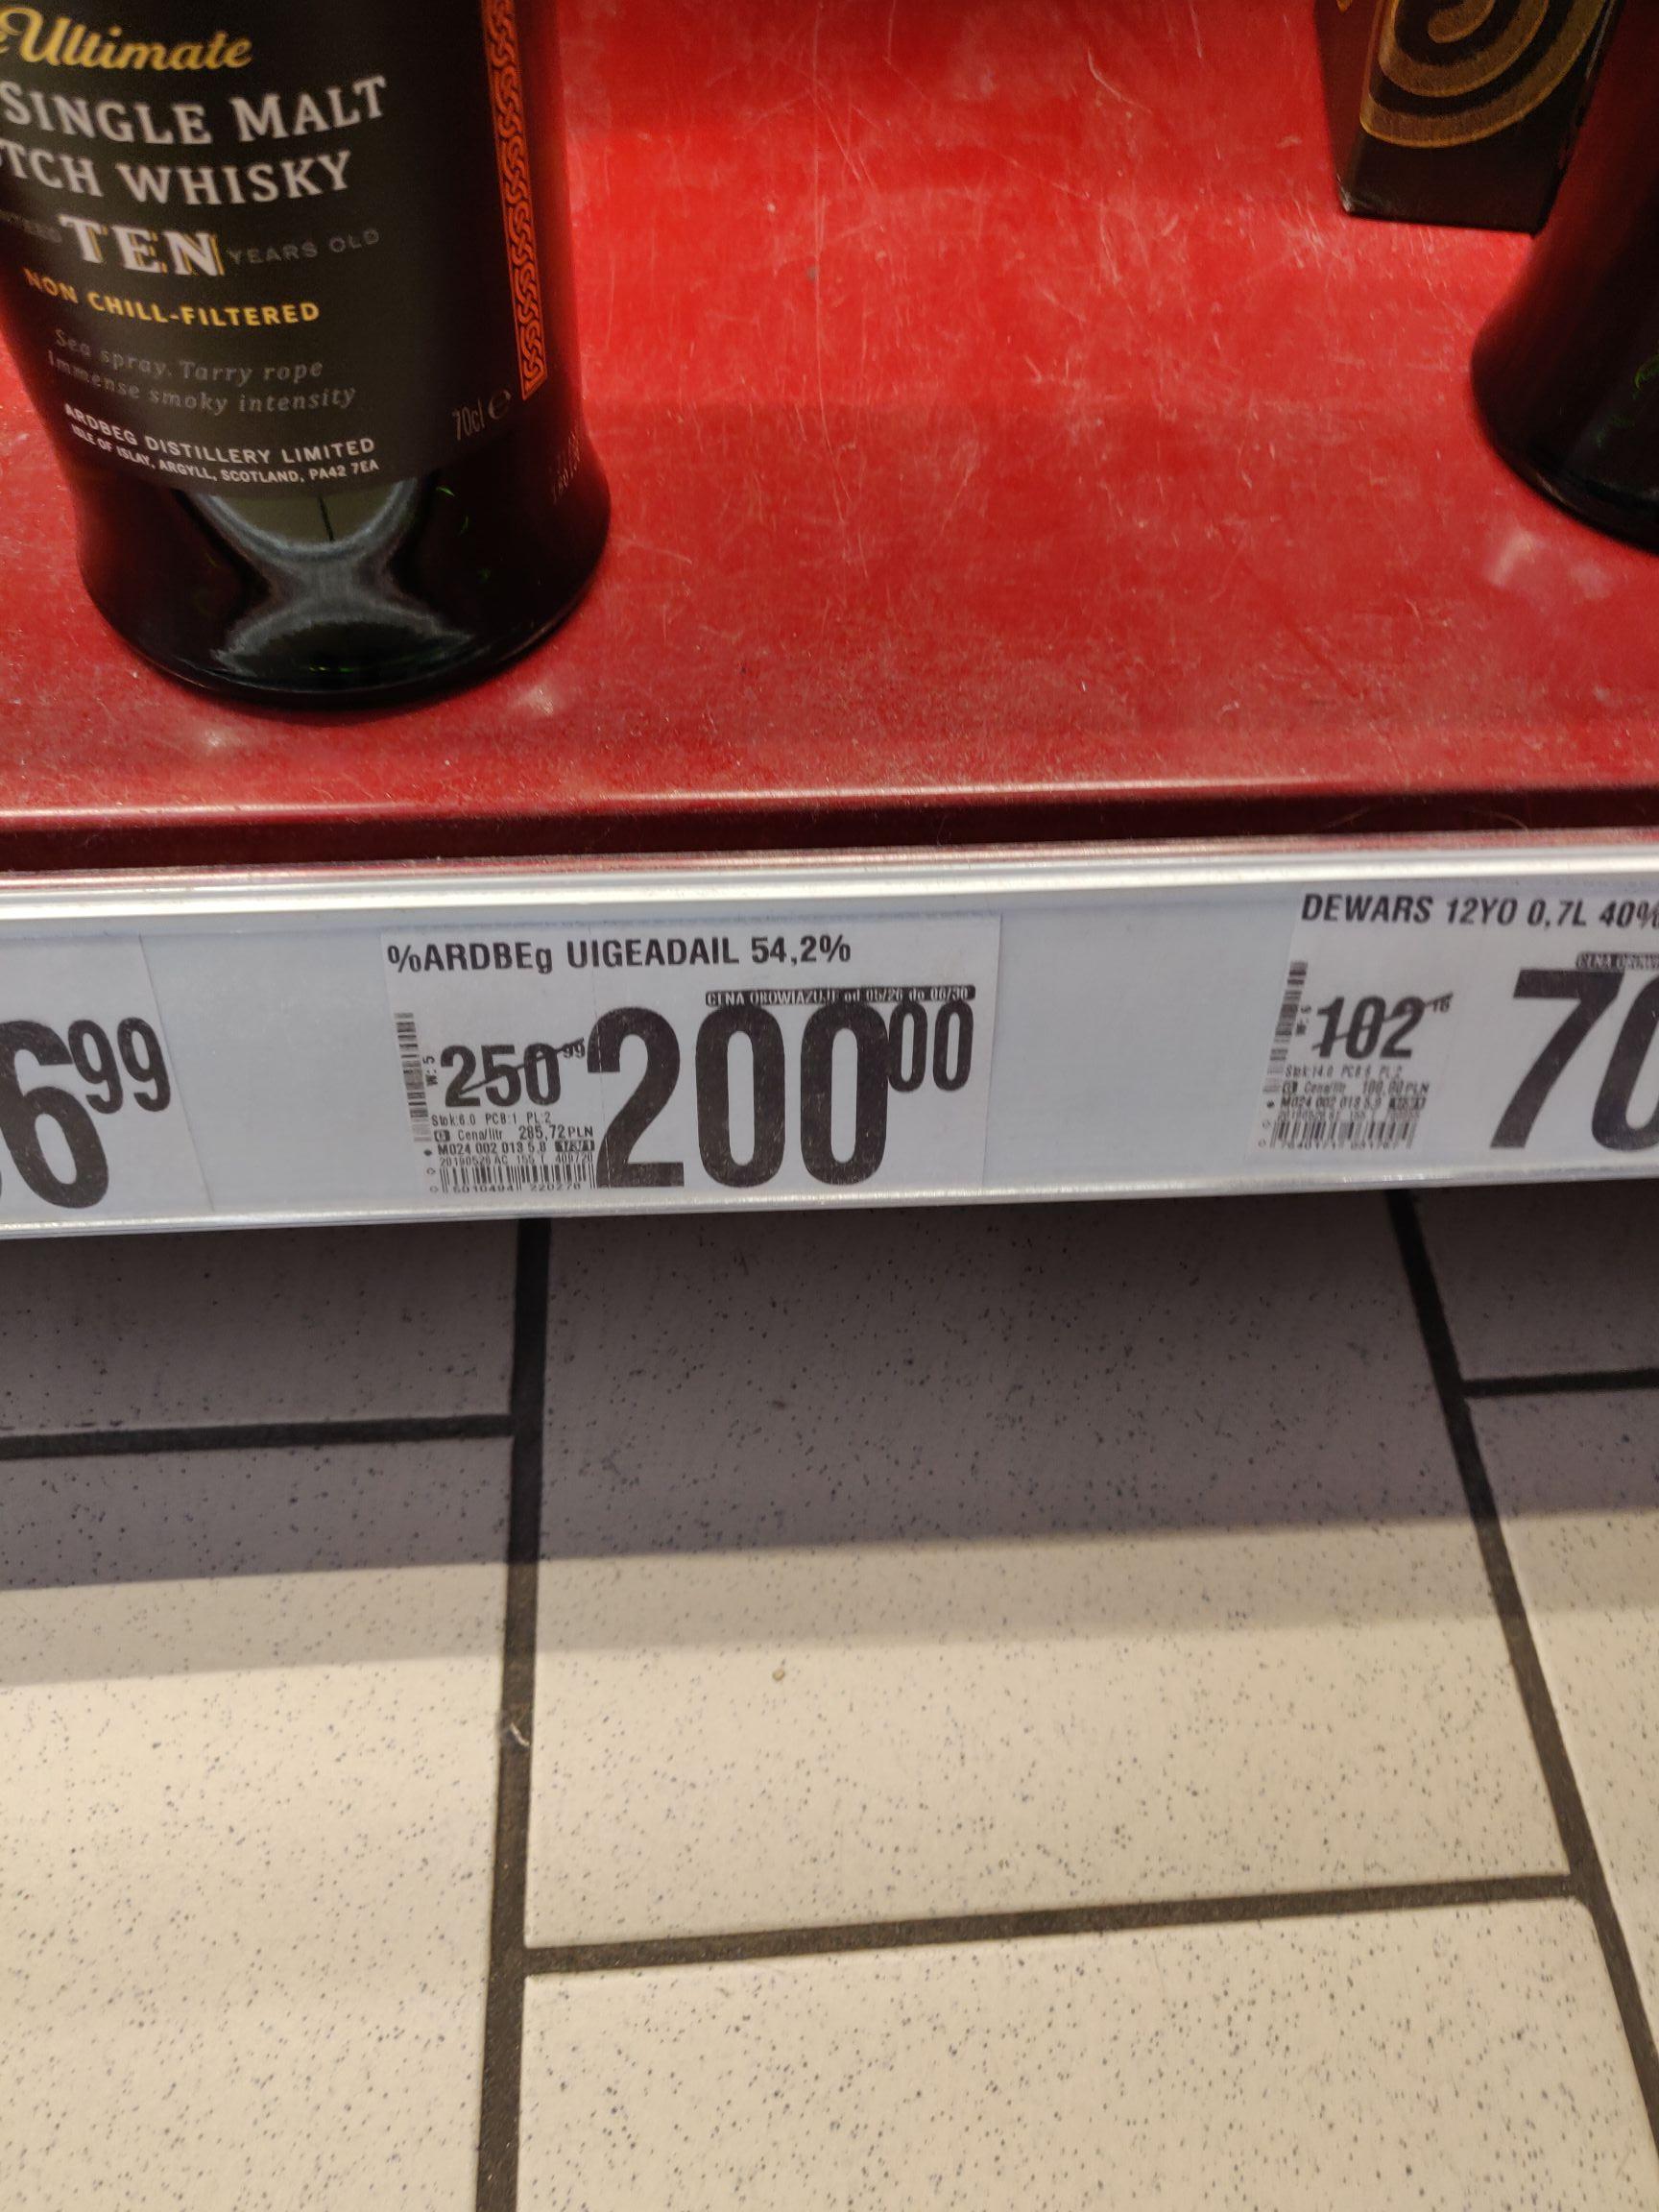 Whisky Ardbeg Uigedail 54,2% Single Malt